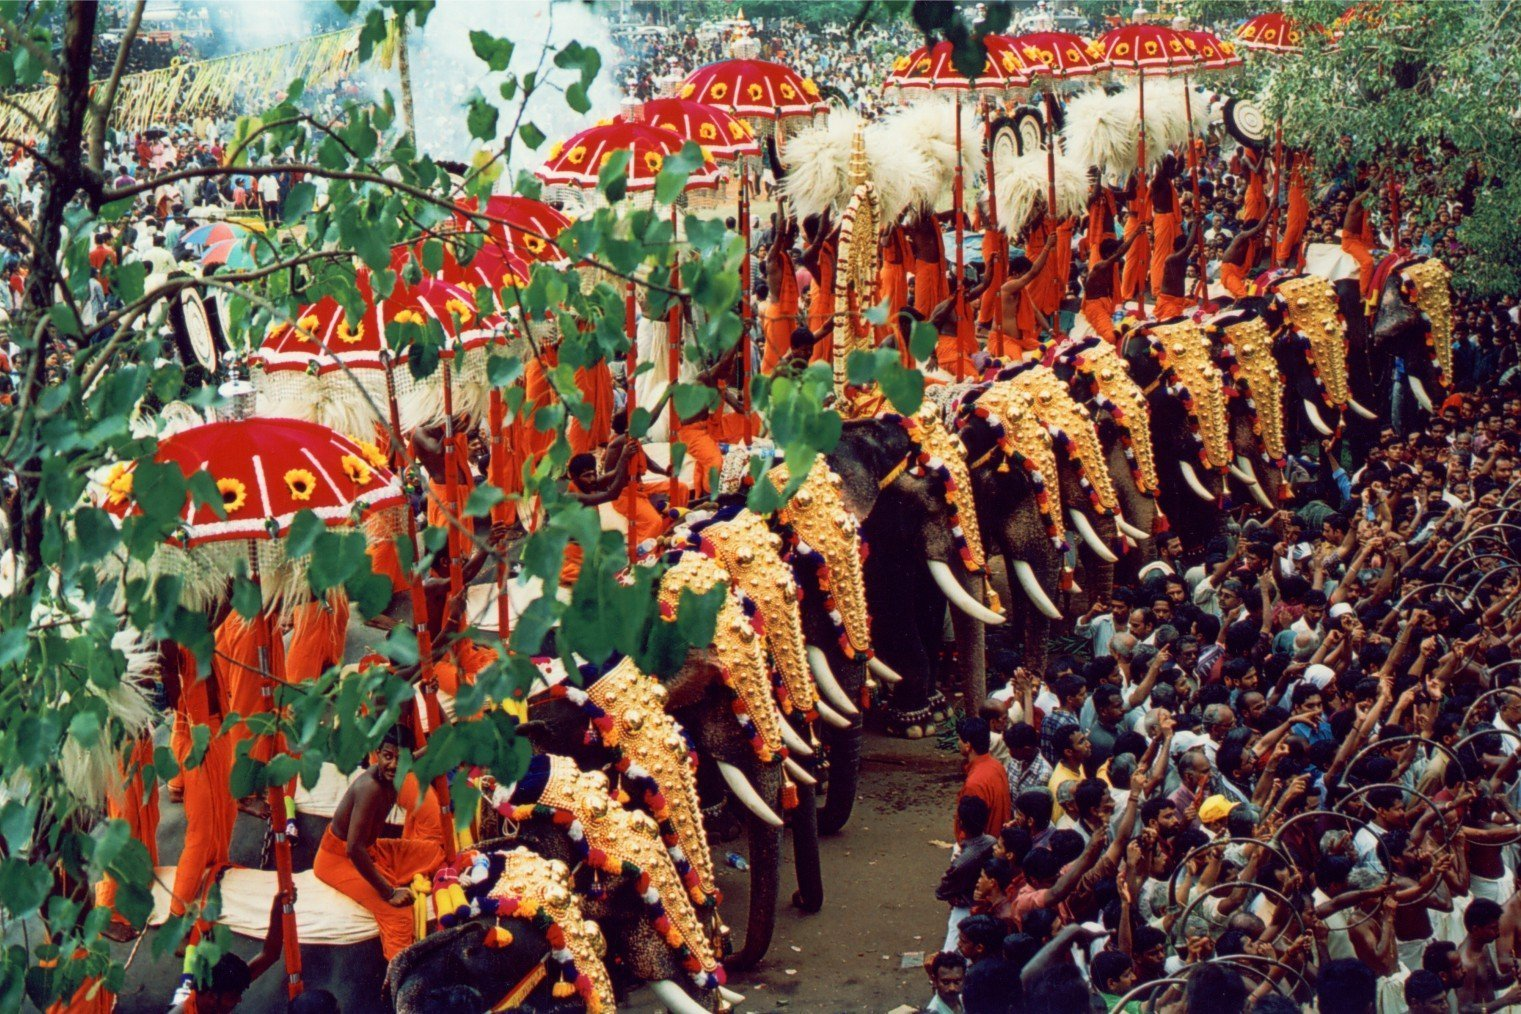 Thrissur Pooram - Elephant Festival, Kerala, India. Триссур Пурам - Фестиваль Слонов